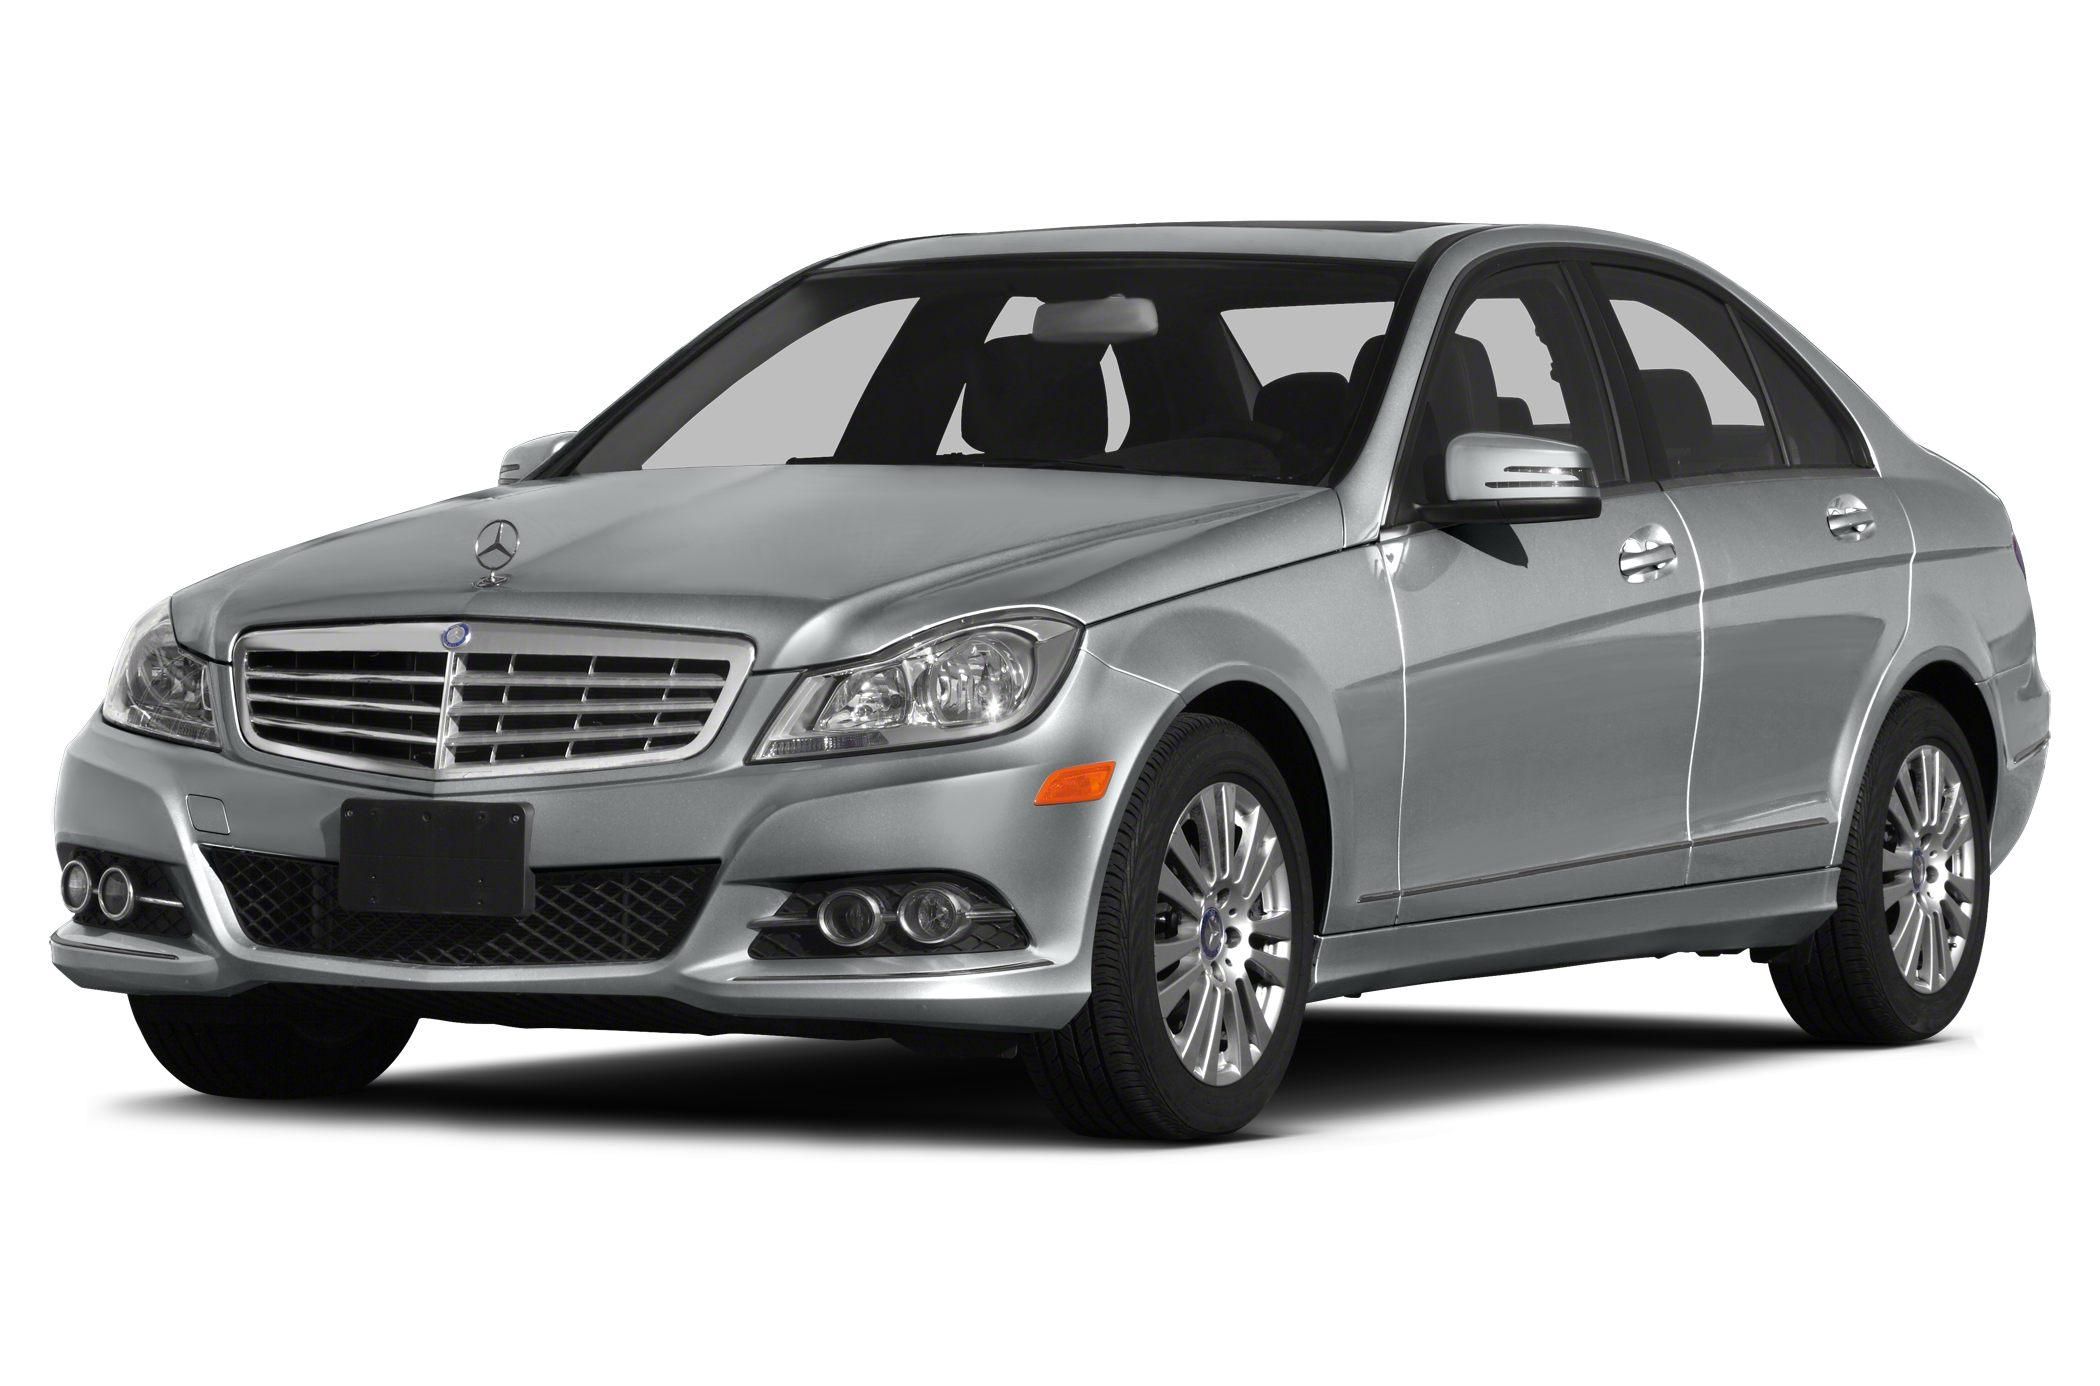 2014 MERCEDES C-Class C250 Luxury This 2014 Mercedes-Benz C-Class 4dr 4dr Sedan C250 Luxury RWD fe